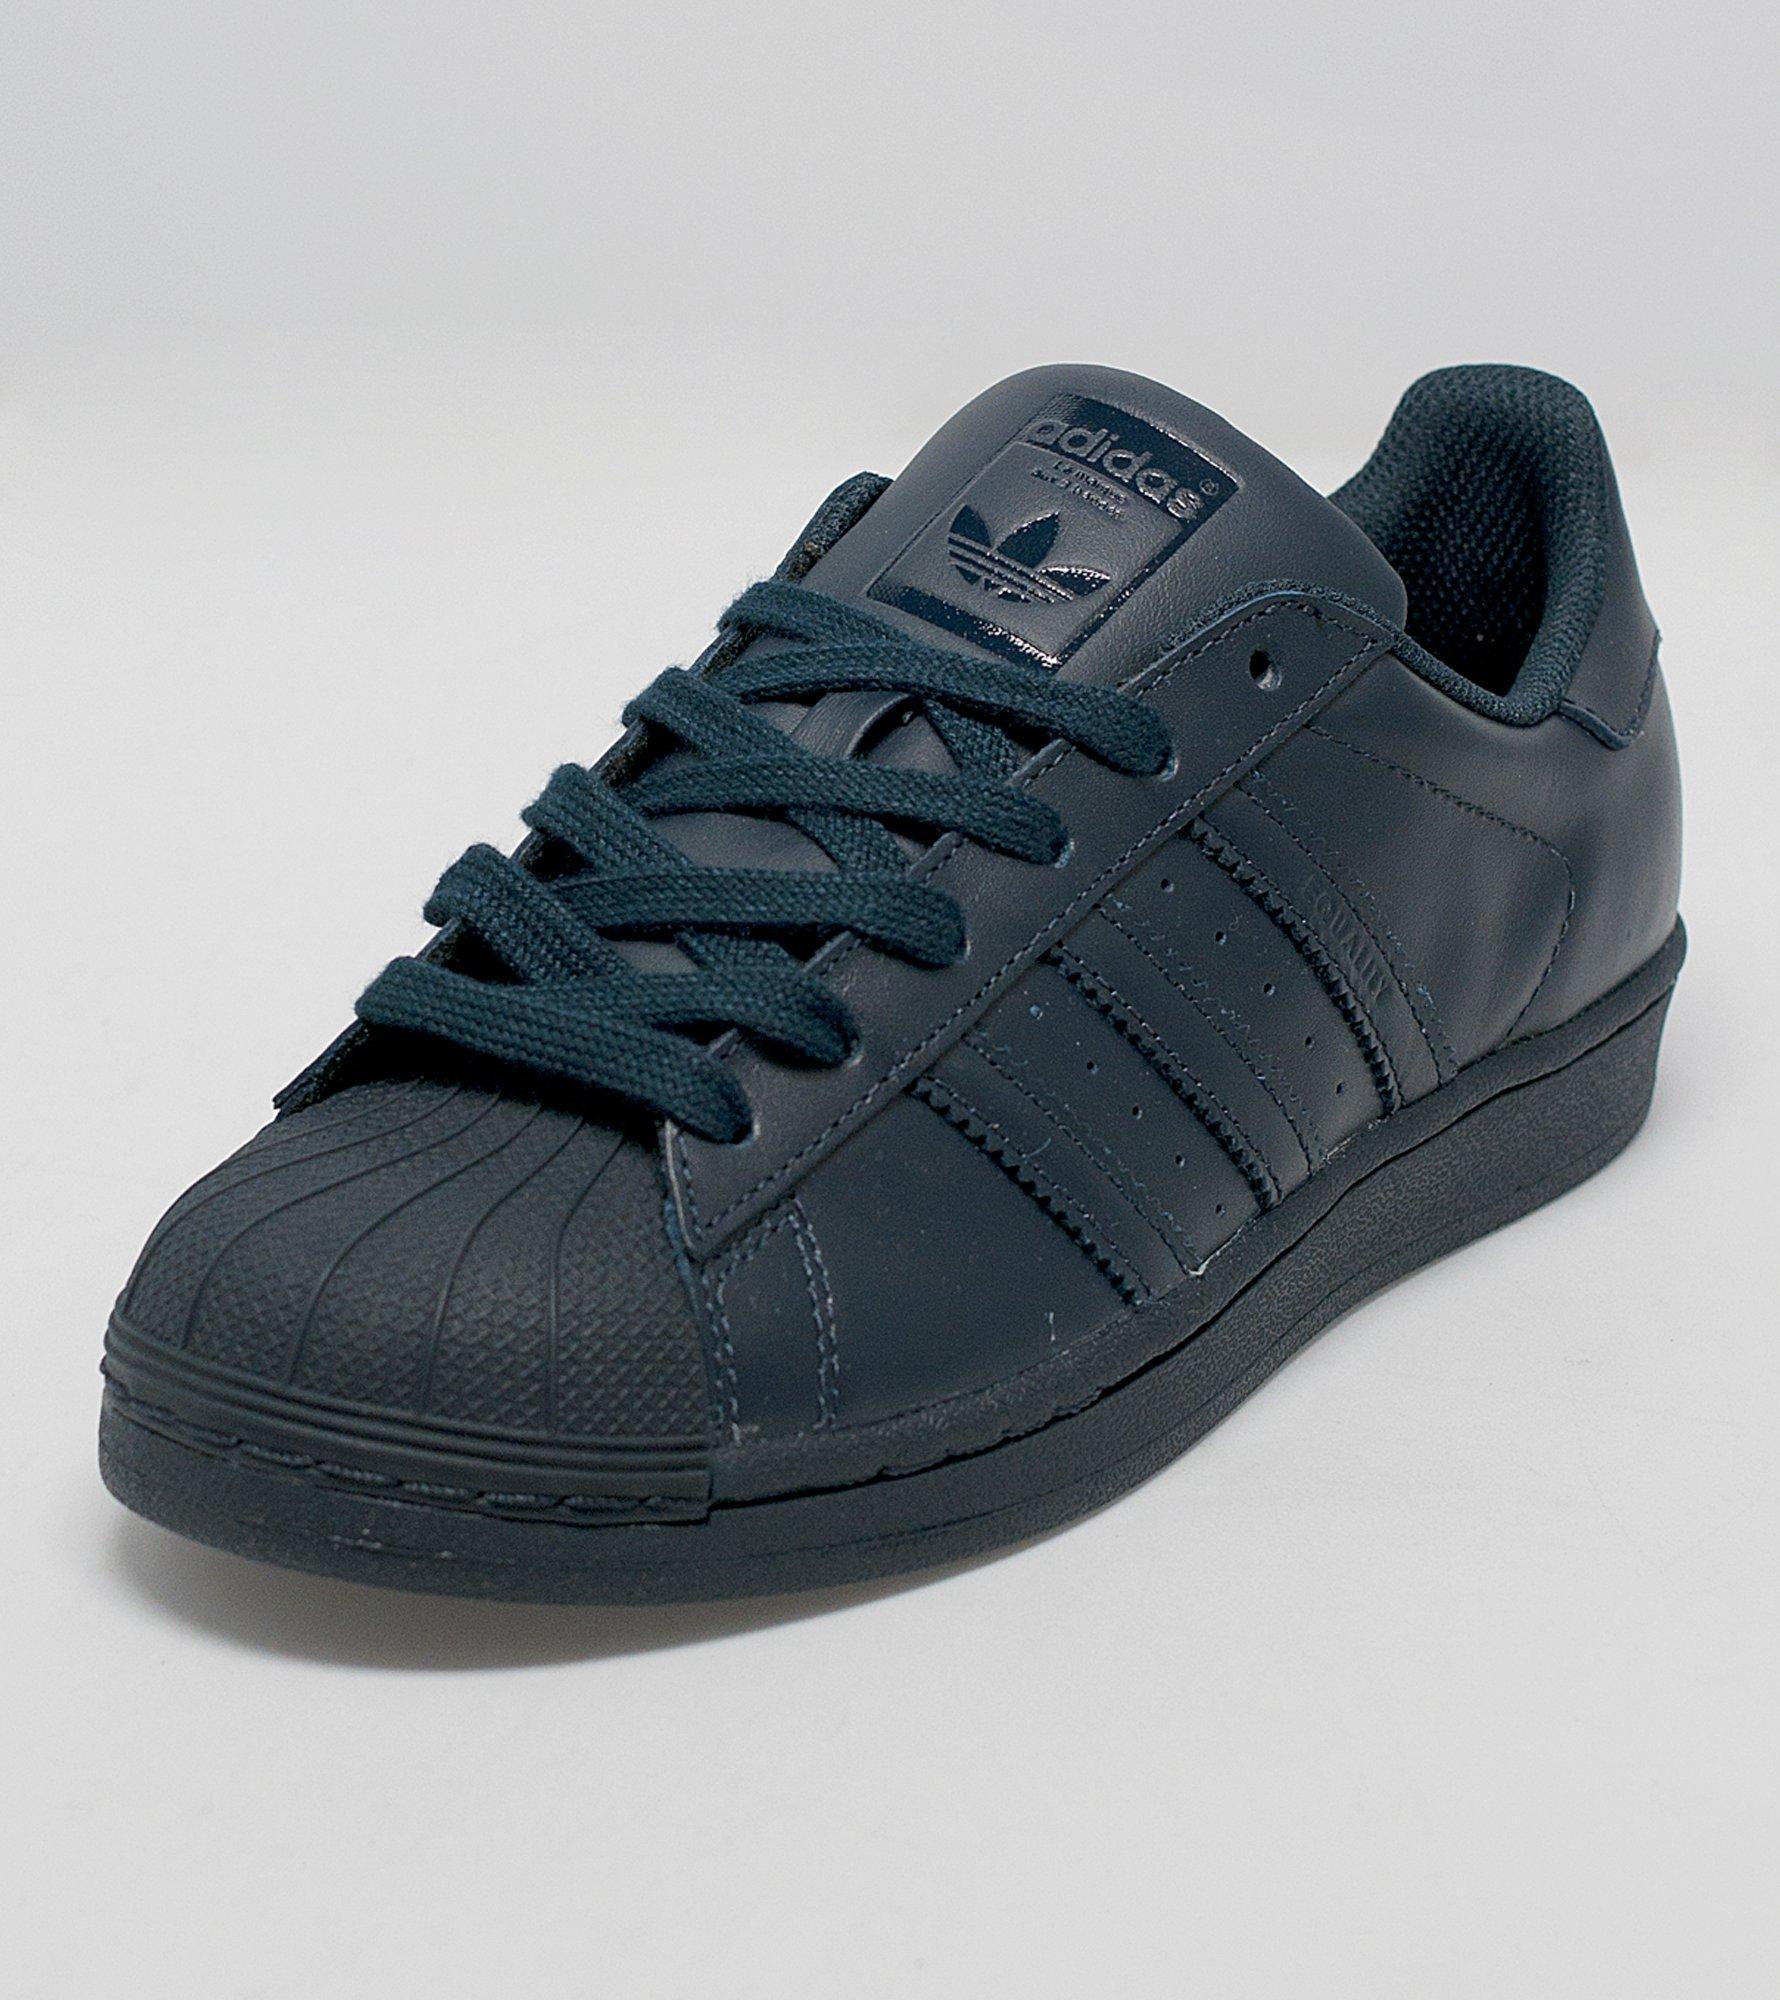 adidas superstar supercolor navy blue